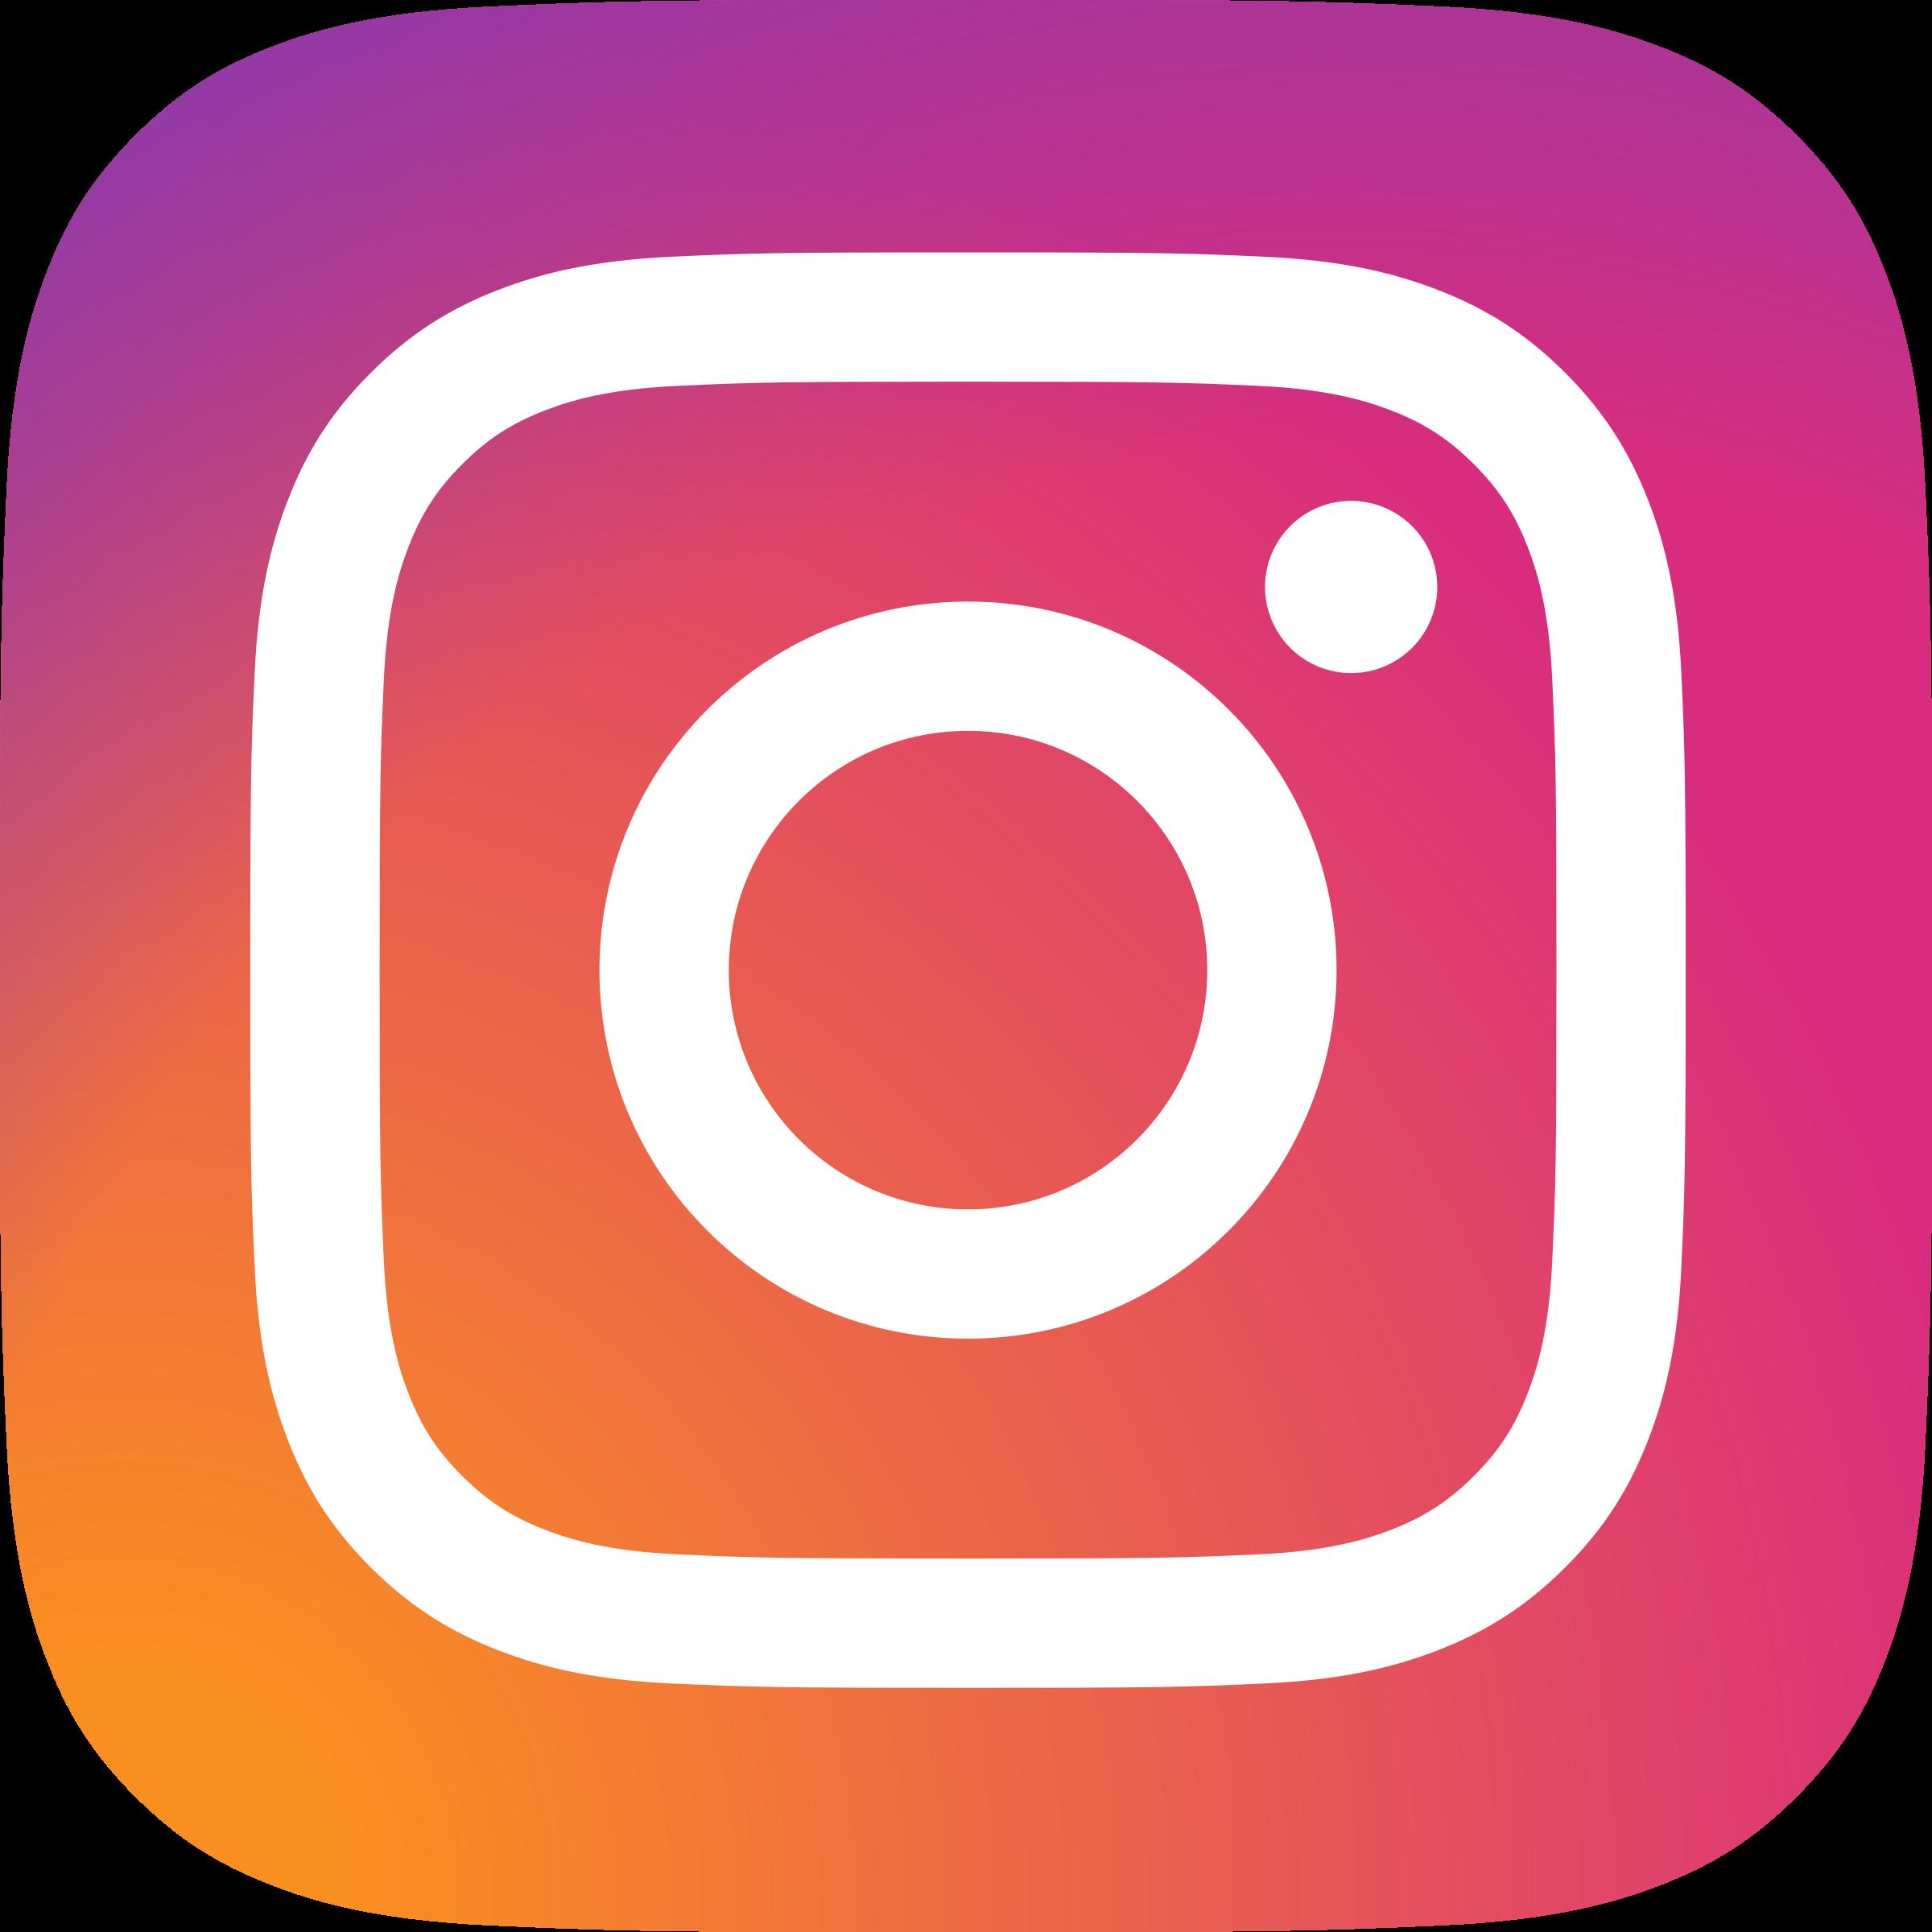 Instagram Transparente.